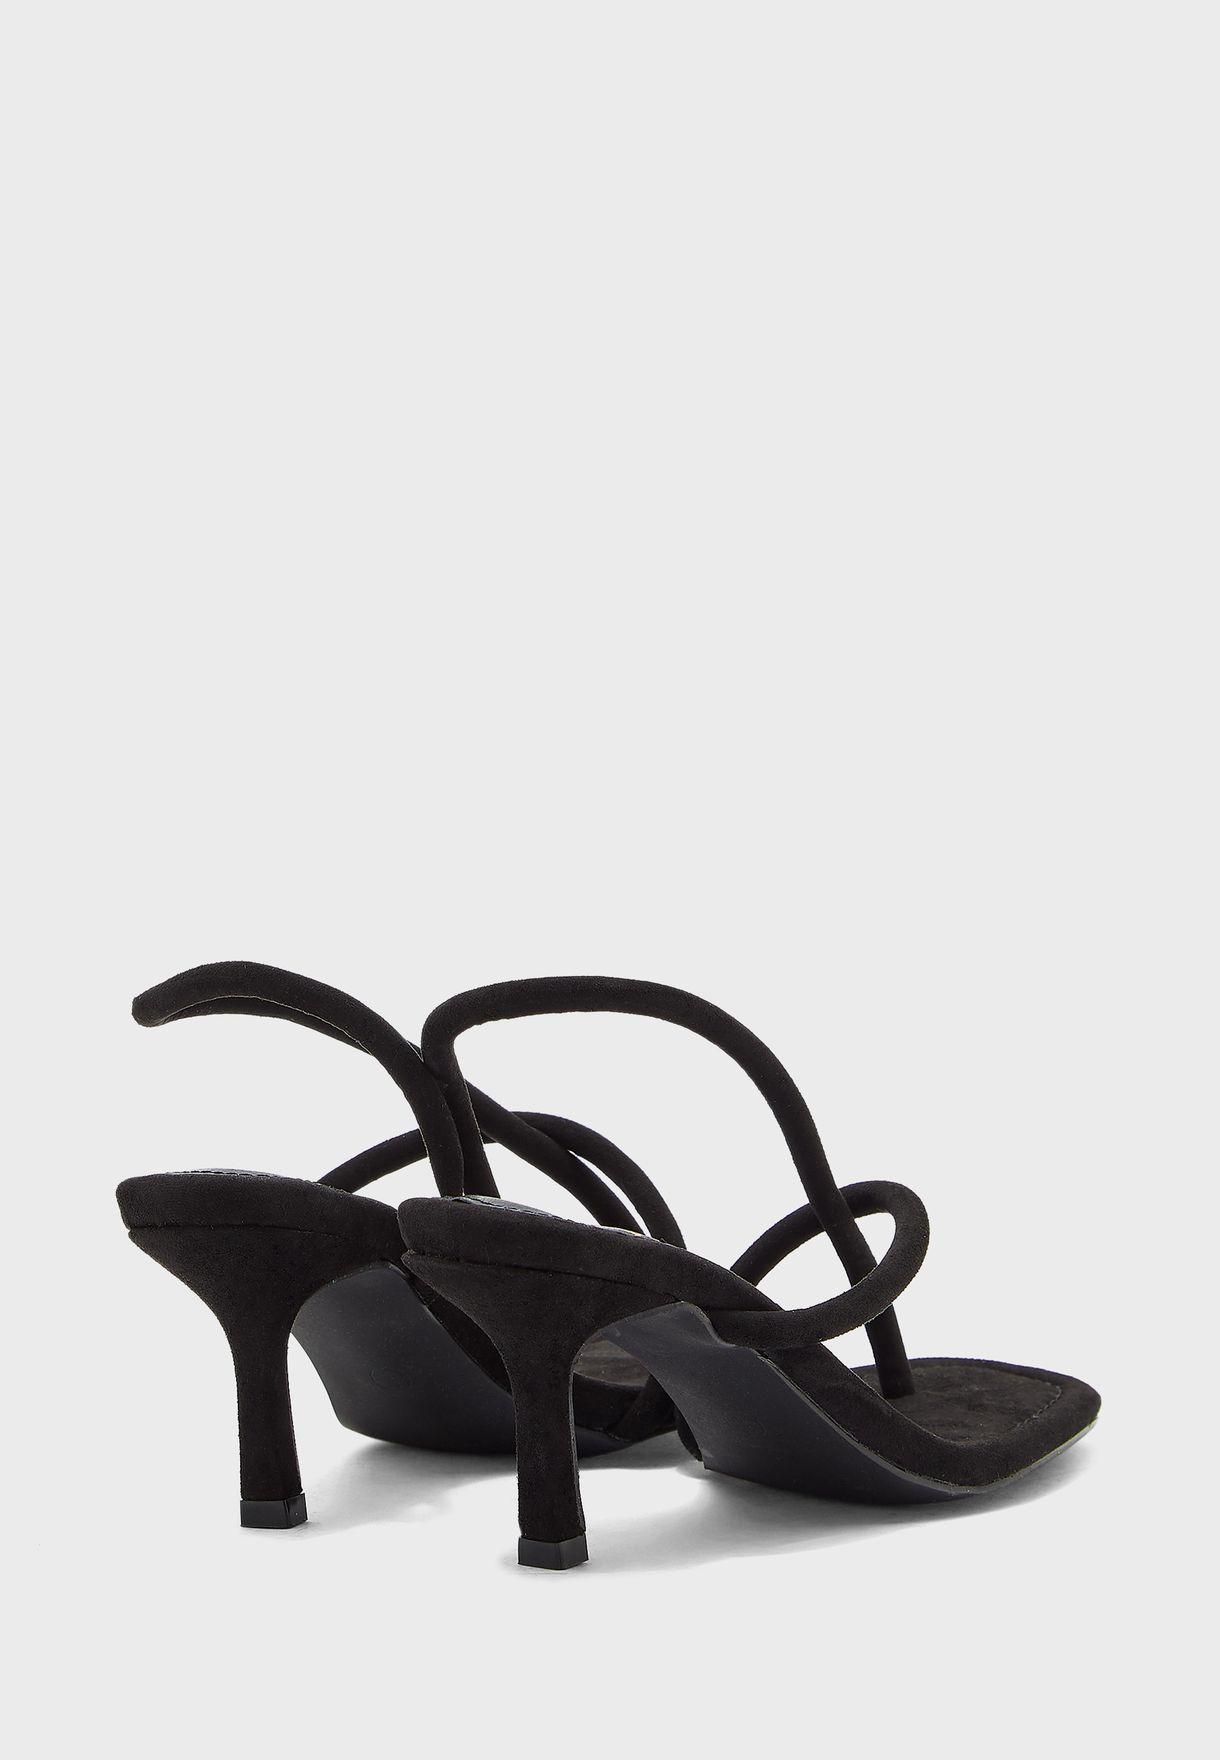 Multi Strap Low Heel Sandals